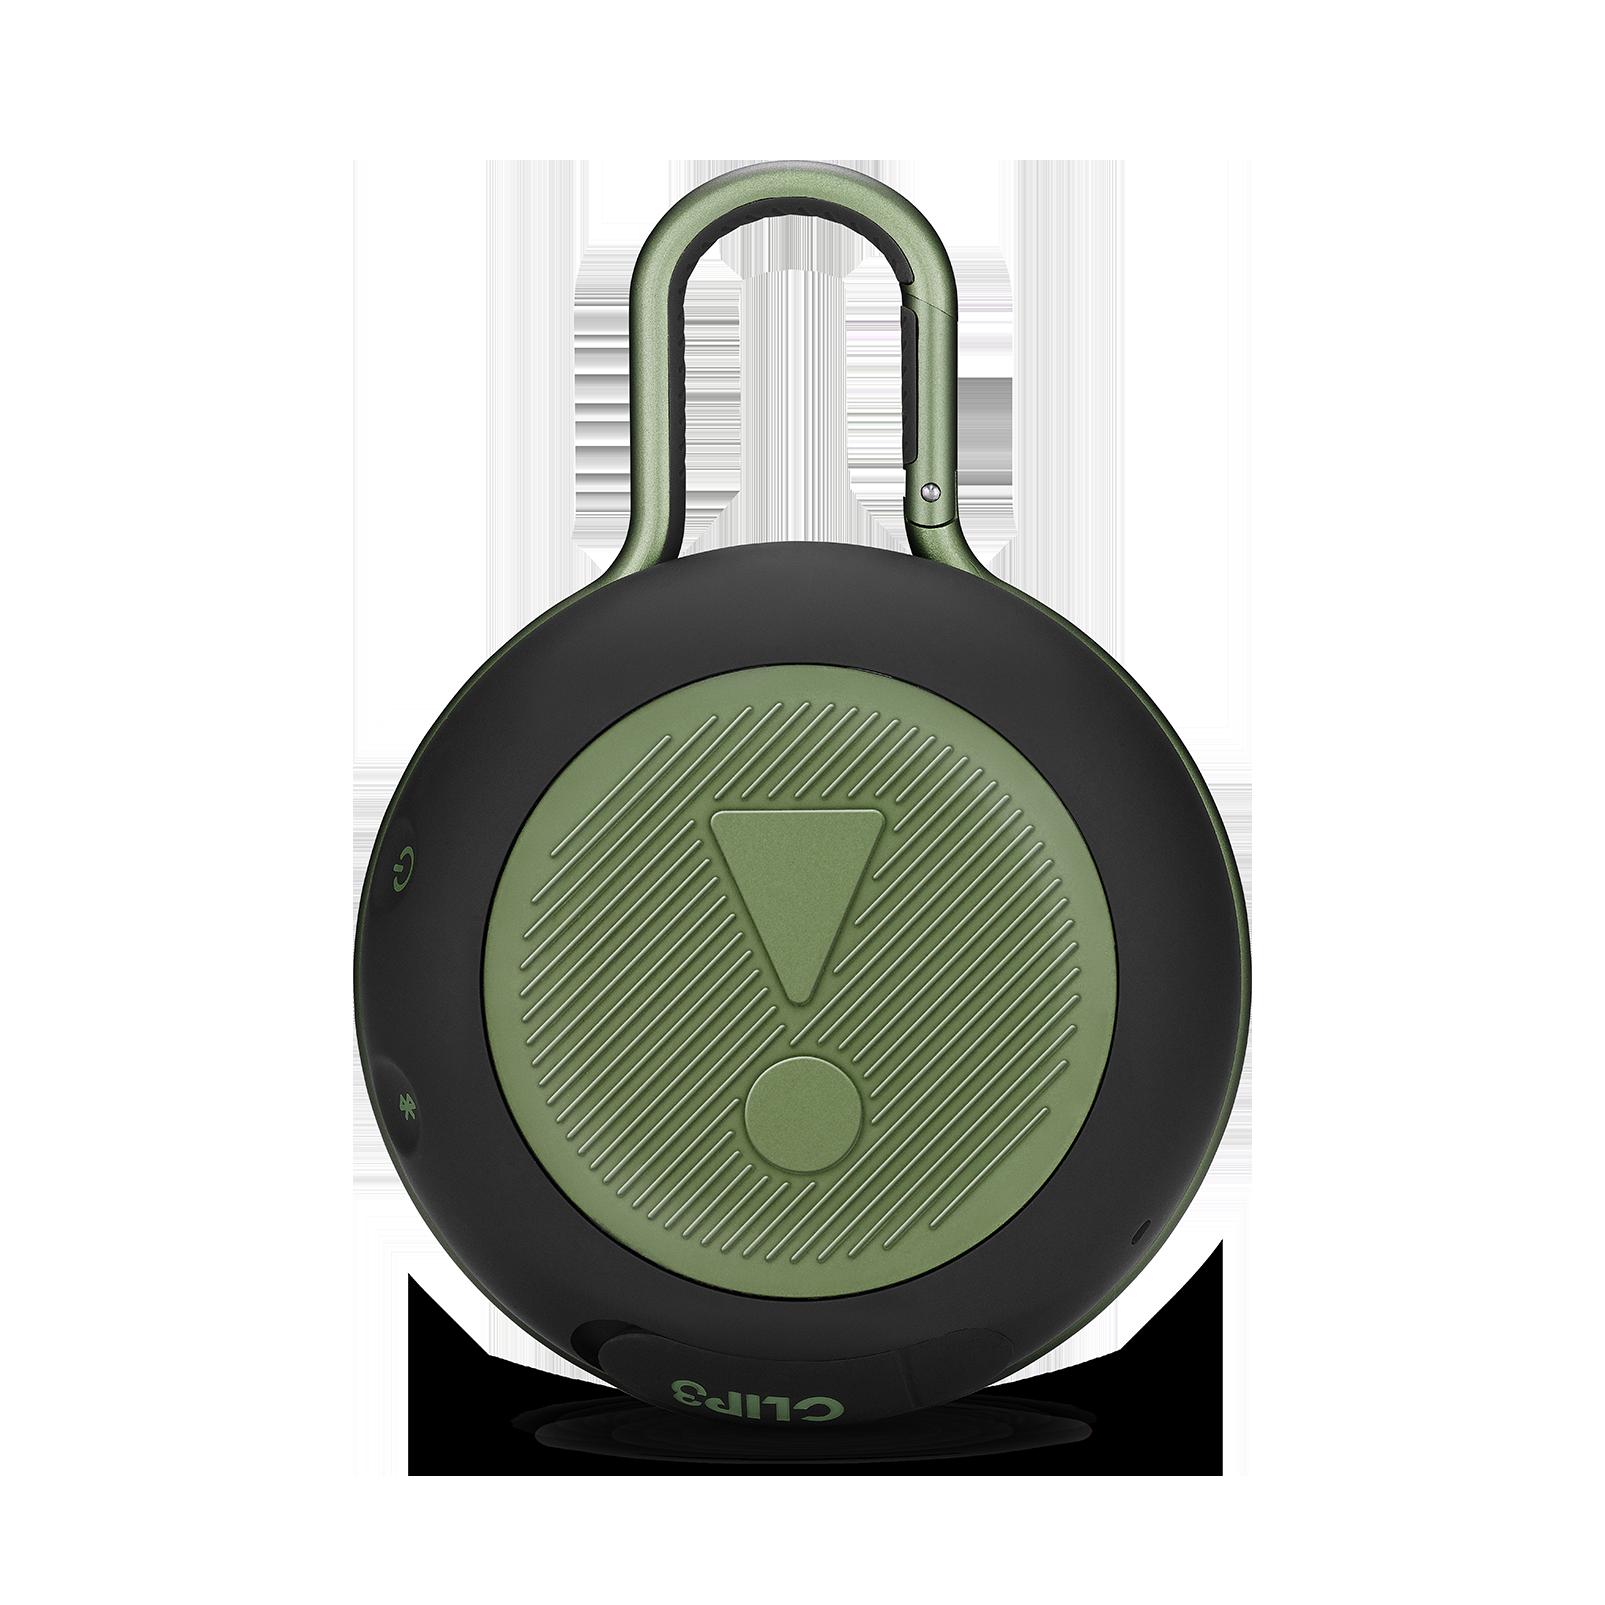 JBL CLIP 3 - Squad - Portable Bluetooth® speaker - Back